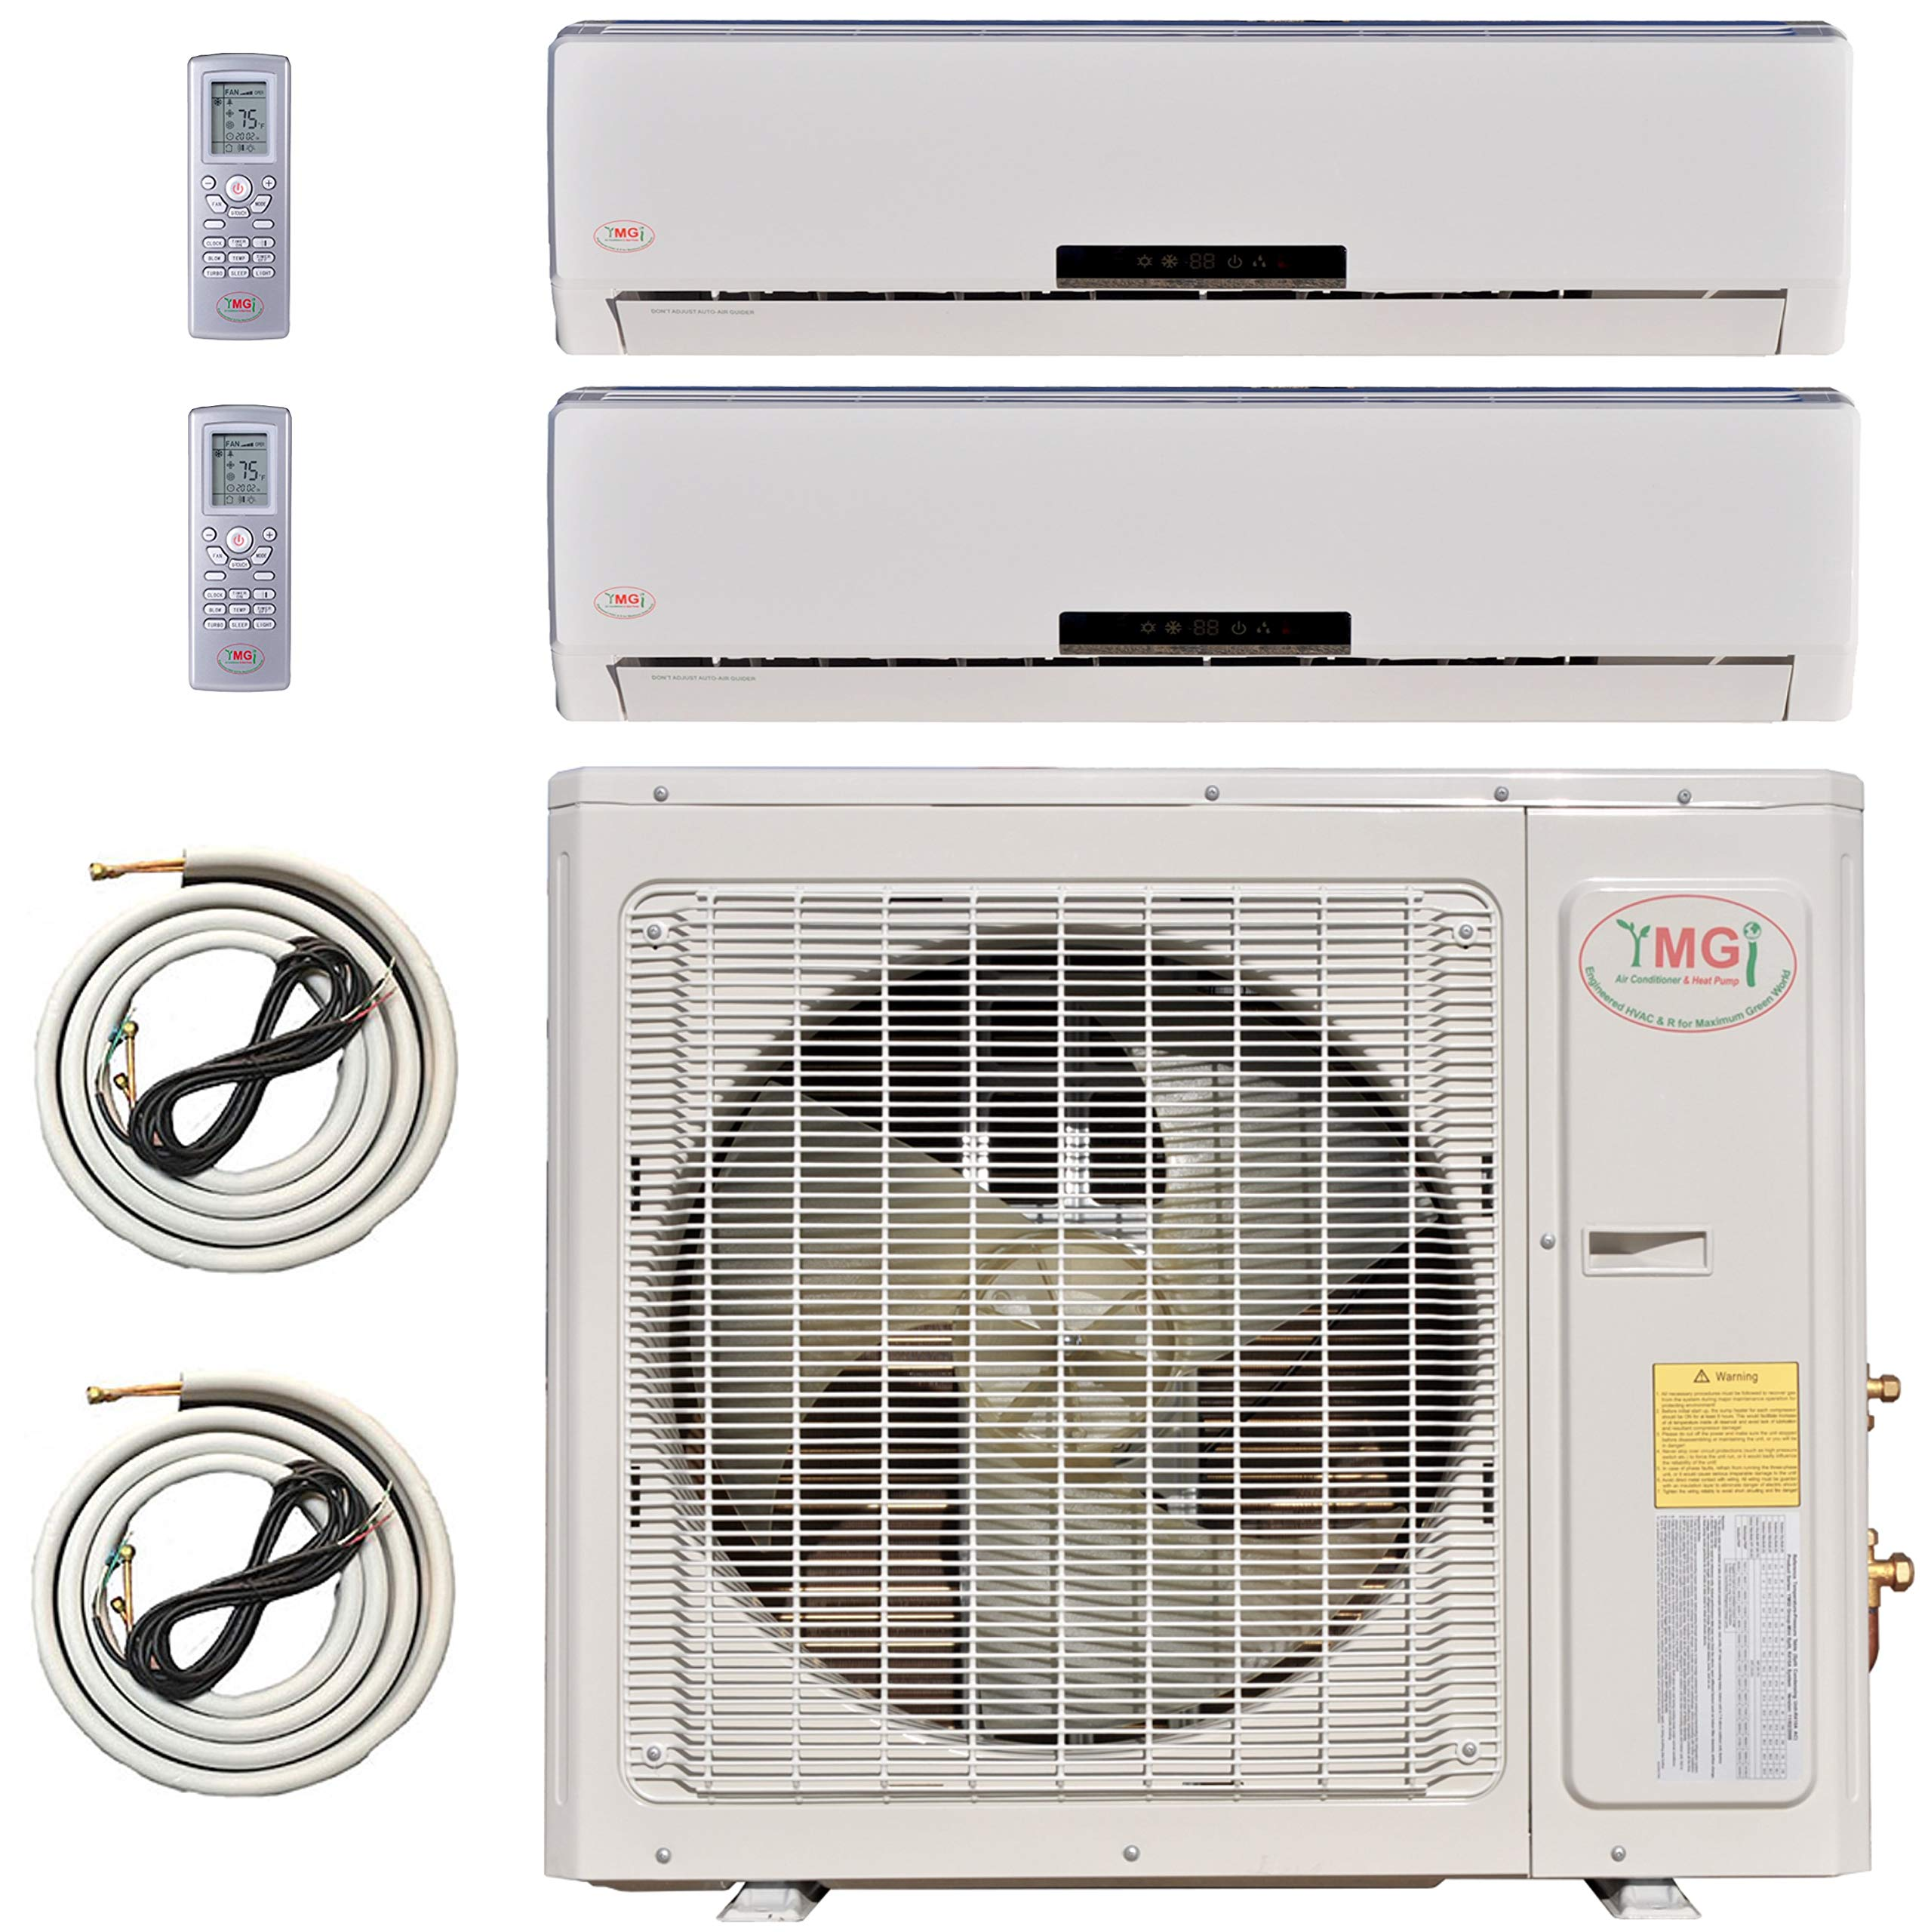 Ymgi Multi Zone Mini Split Ductless Air Conditioner Dual